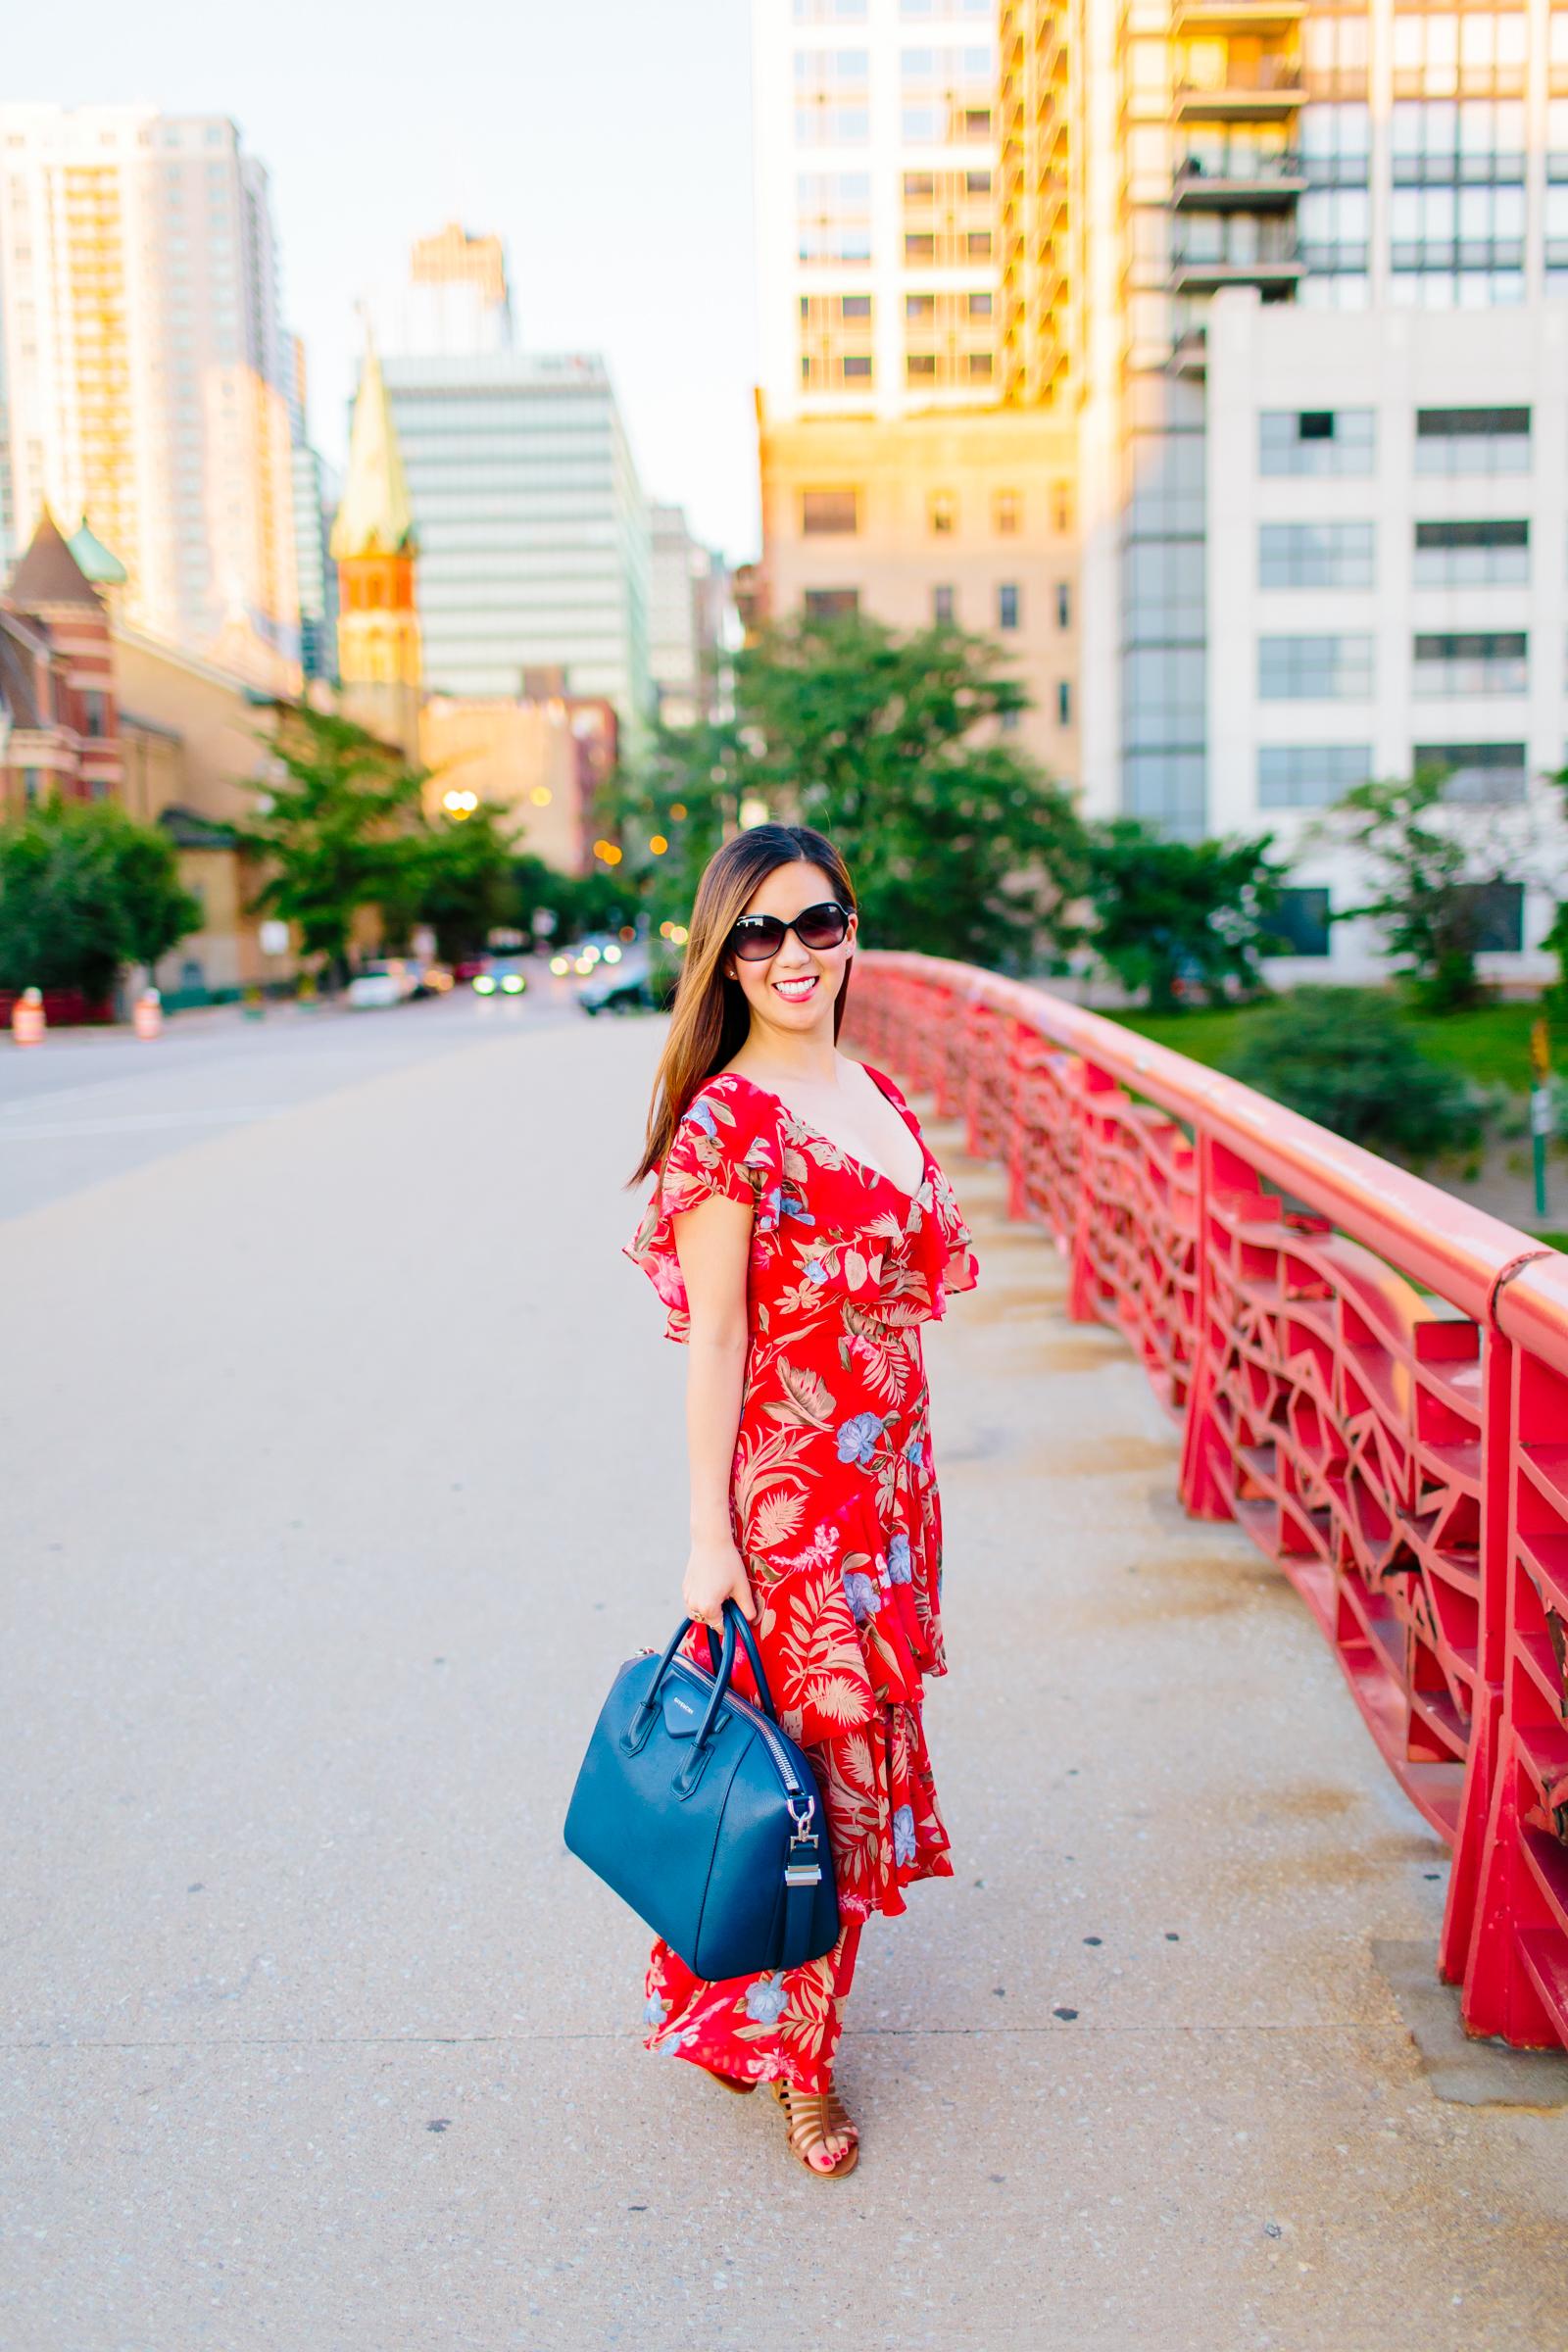 6497cbcea470d Wayf Chelsea Tiered Red Ruffle Dress, Givenchy Antigona, Tia Perciballi  Chicago Fashion and Lifestyle